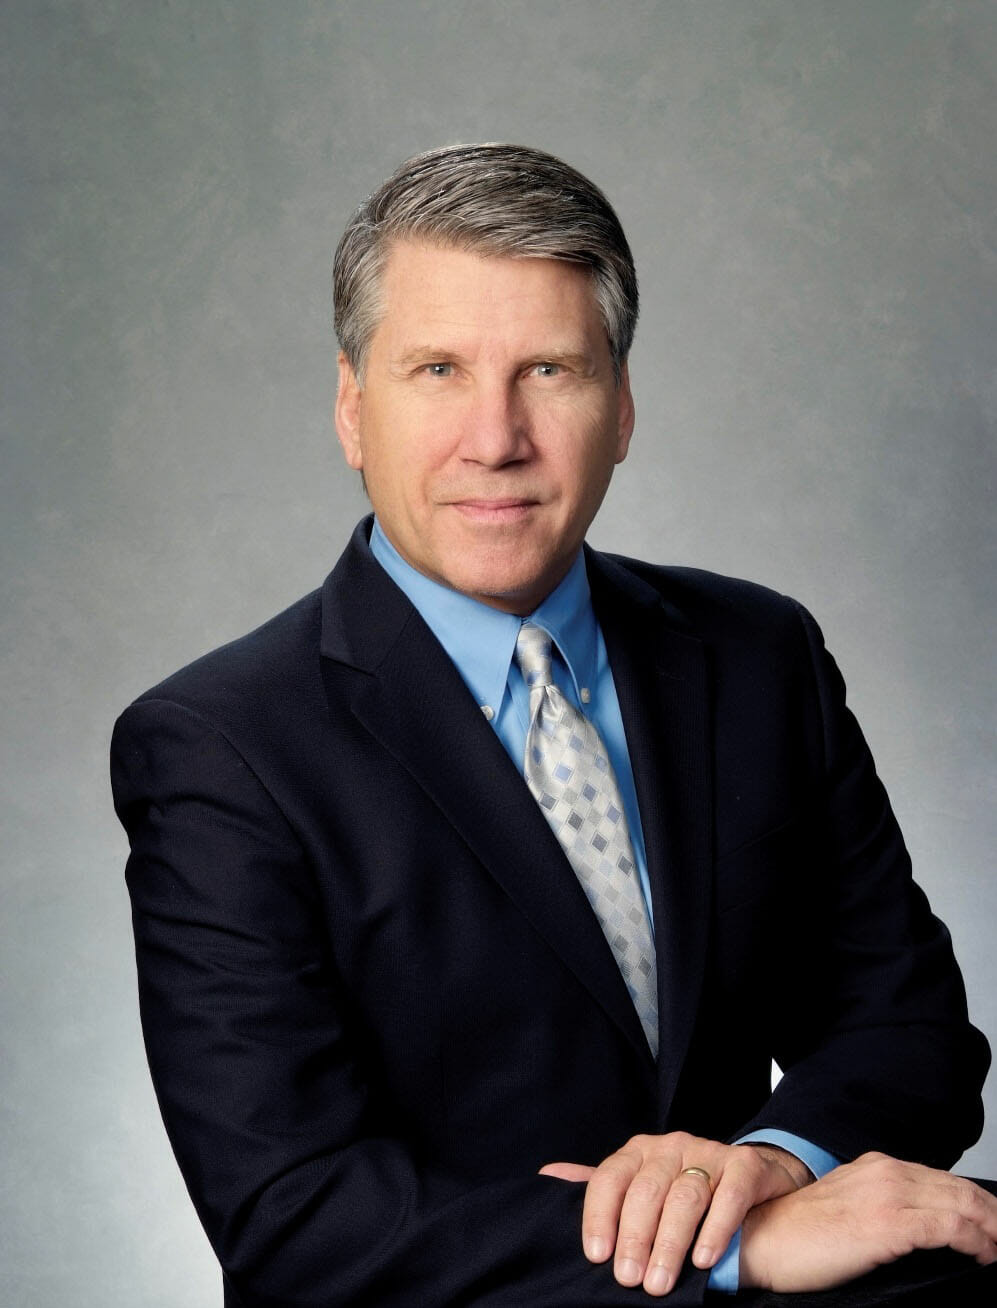 HYUNDAI AUTO CANADA CORP. - Don Romano now President and CEO